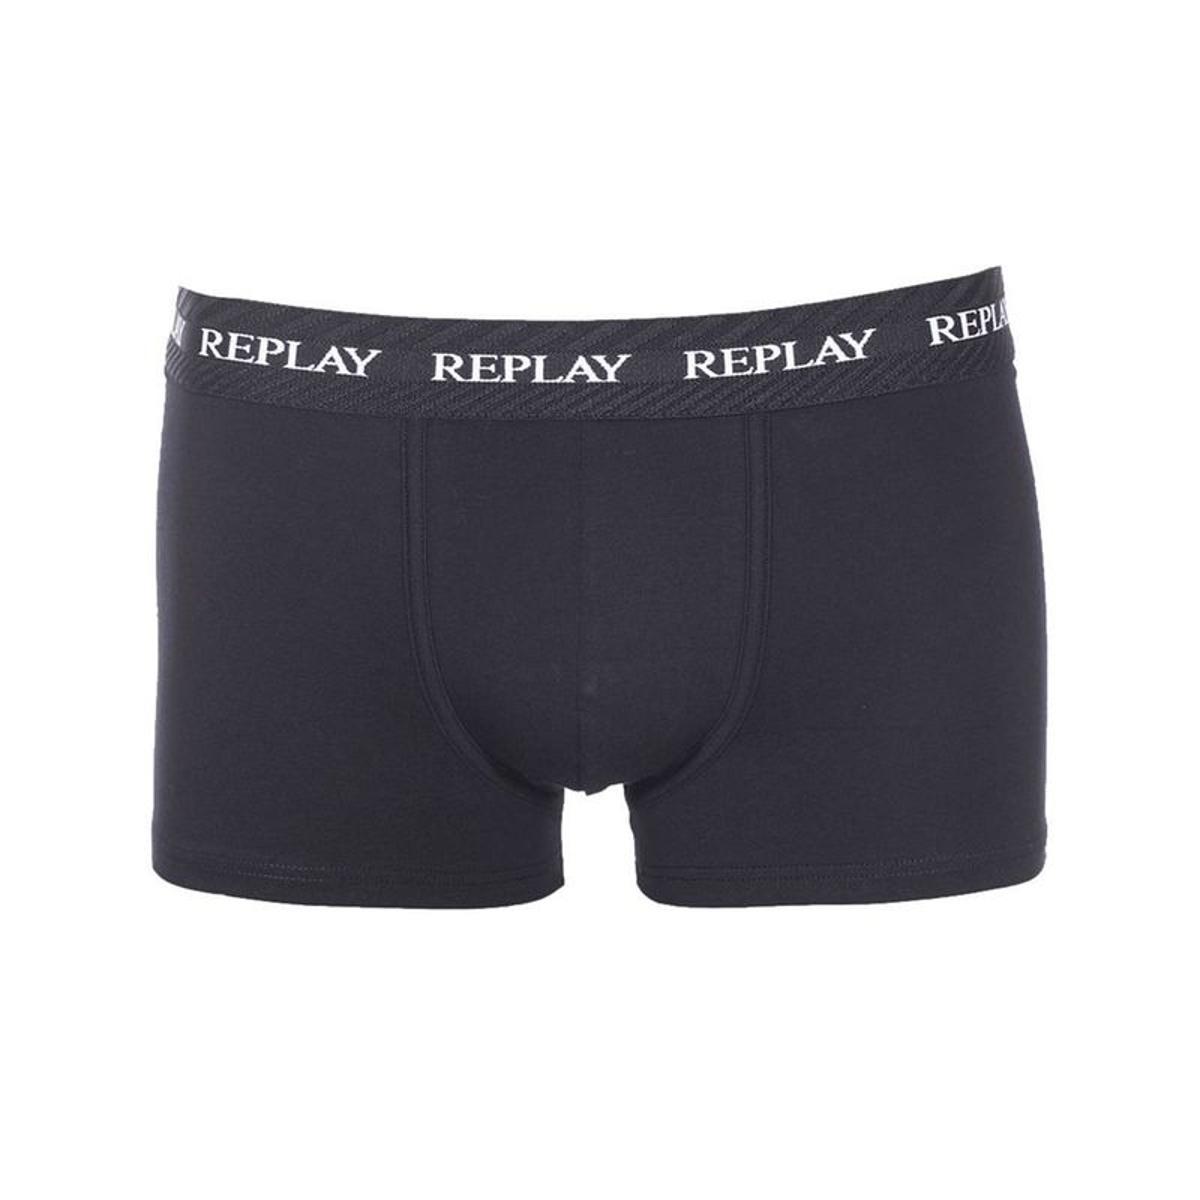 Replay underwear - boxer